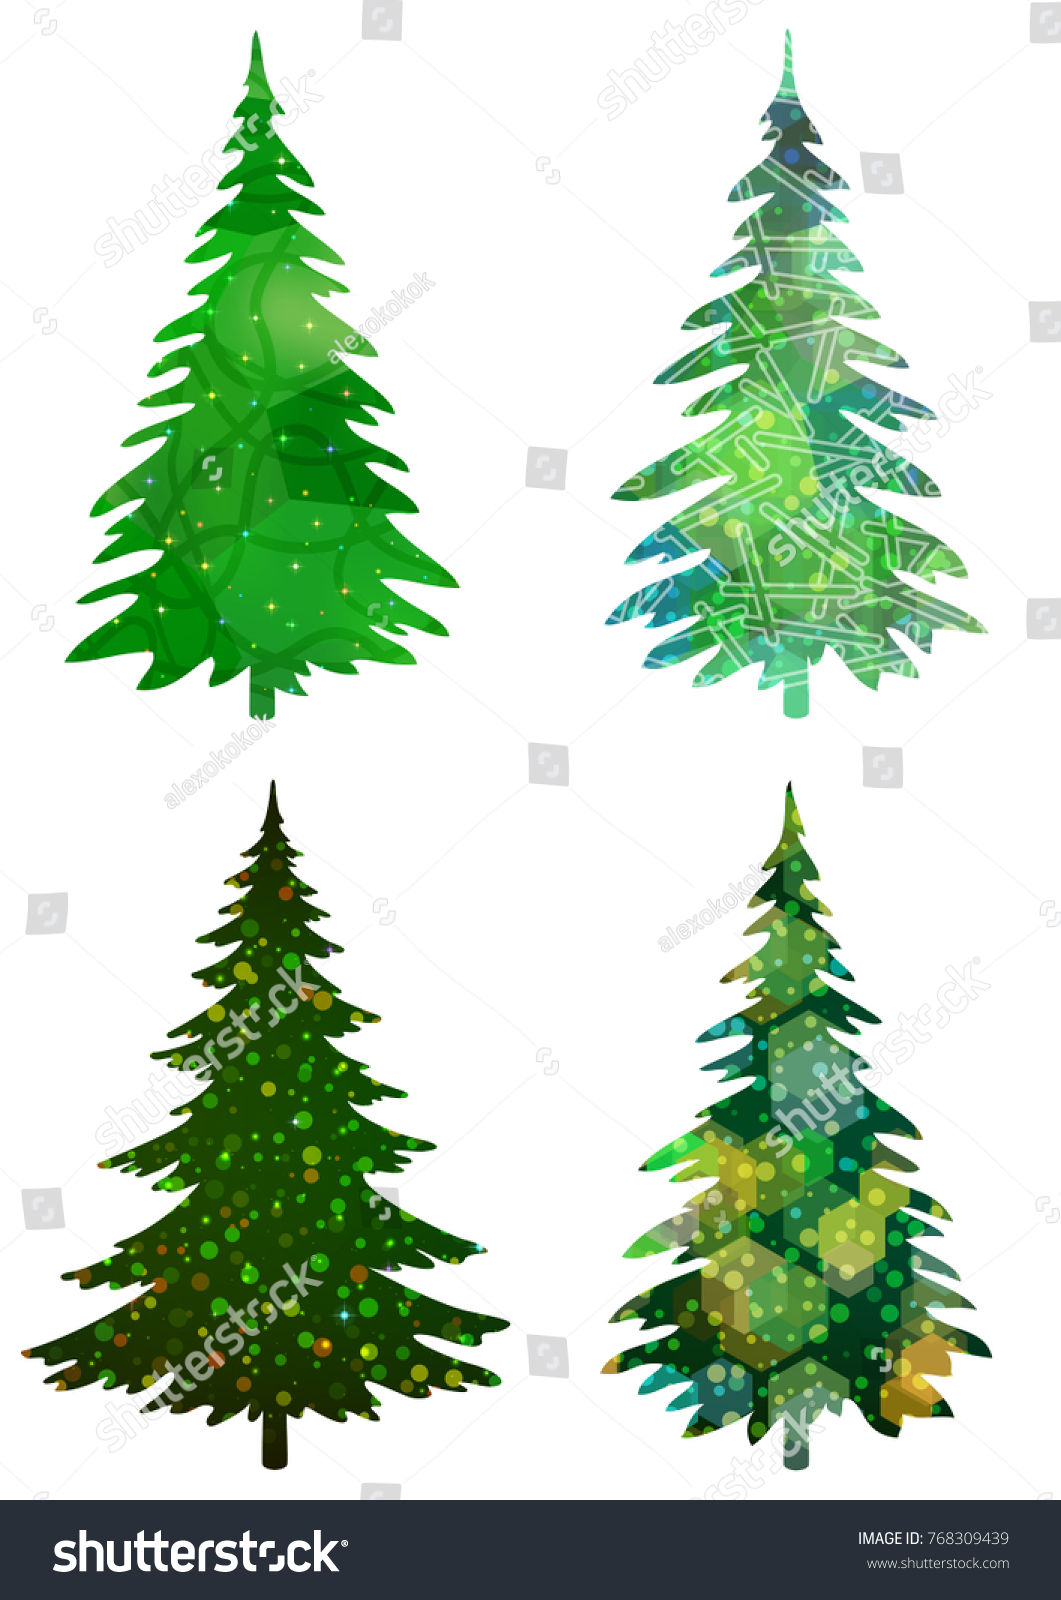 Set Green Holiday Christmas Trees Winter Stock Vector 768309439